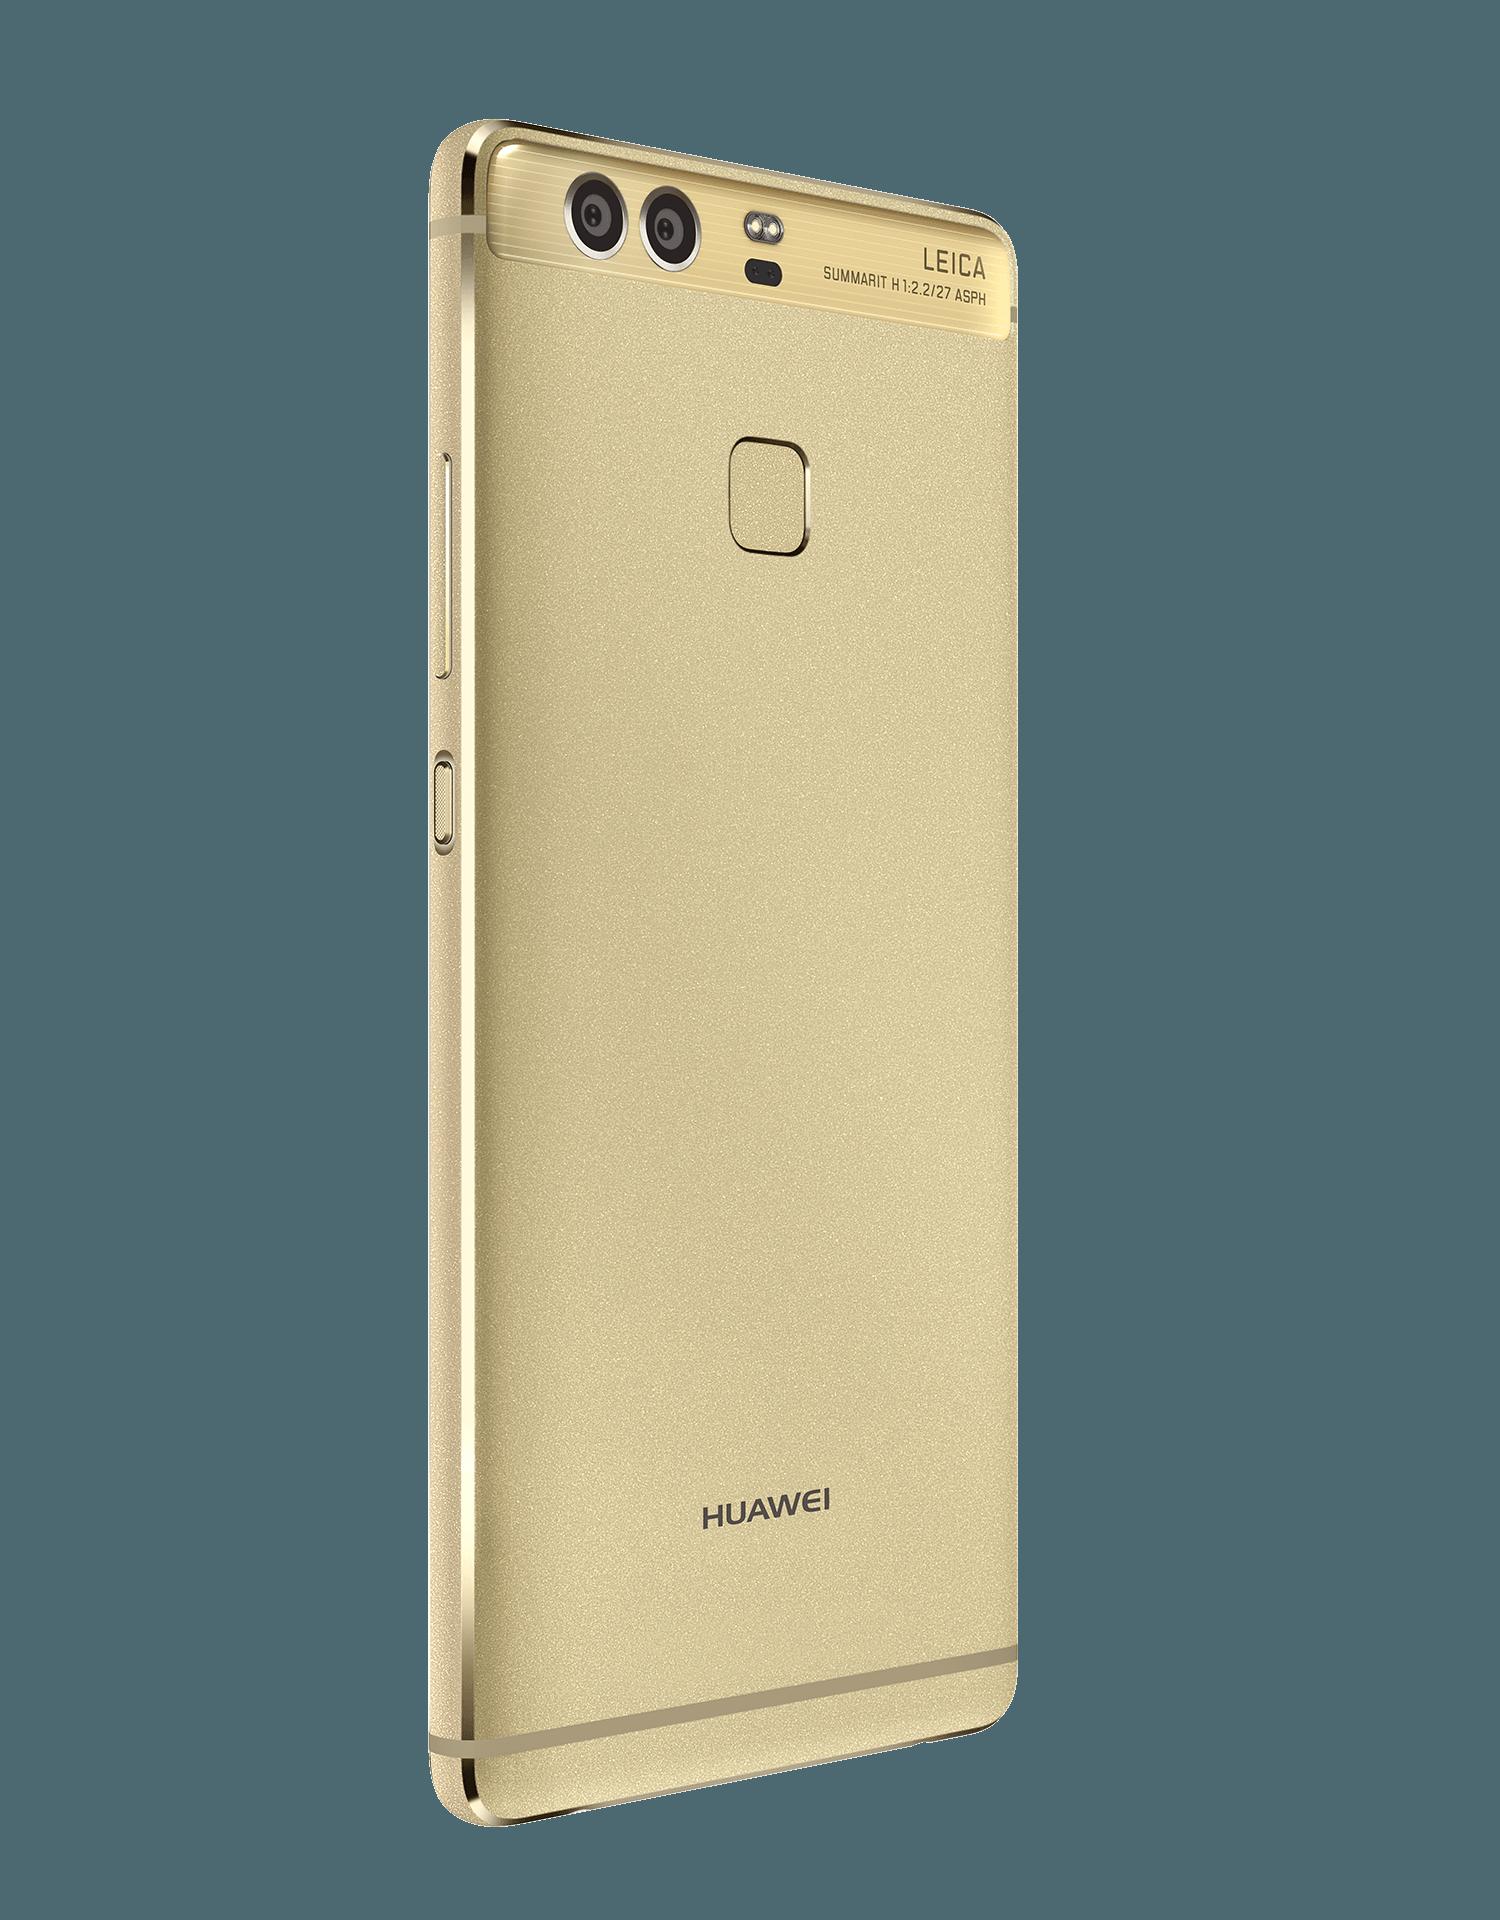 Huawei-P9 – Prestige Gold